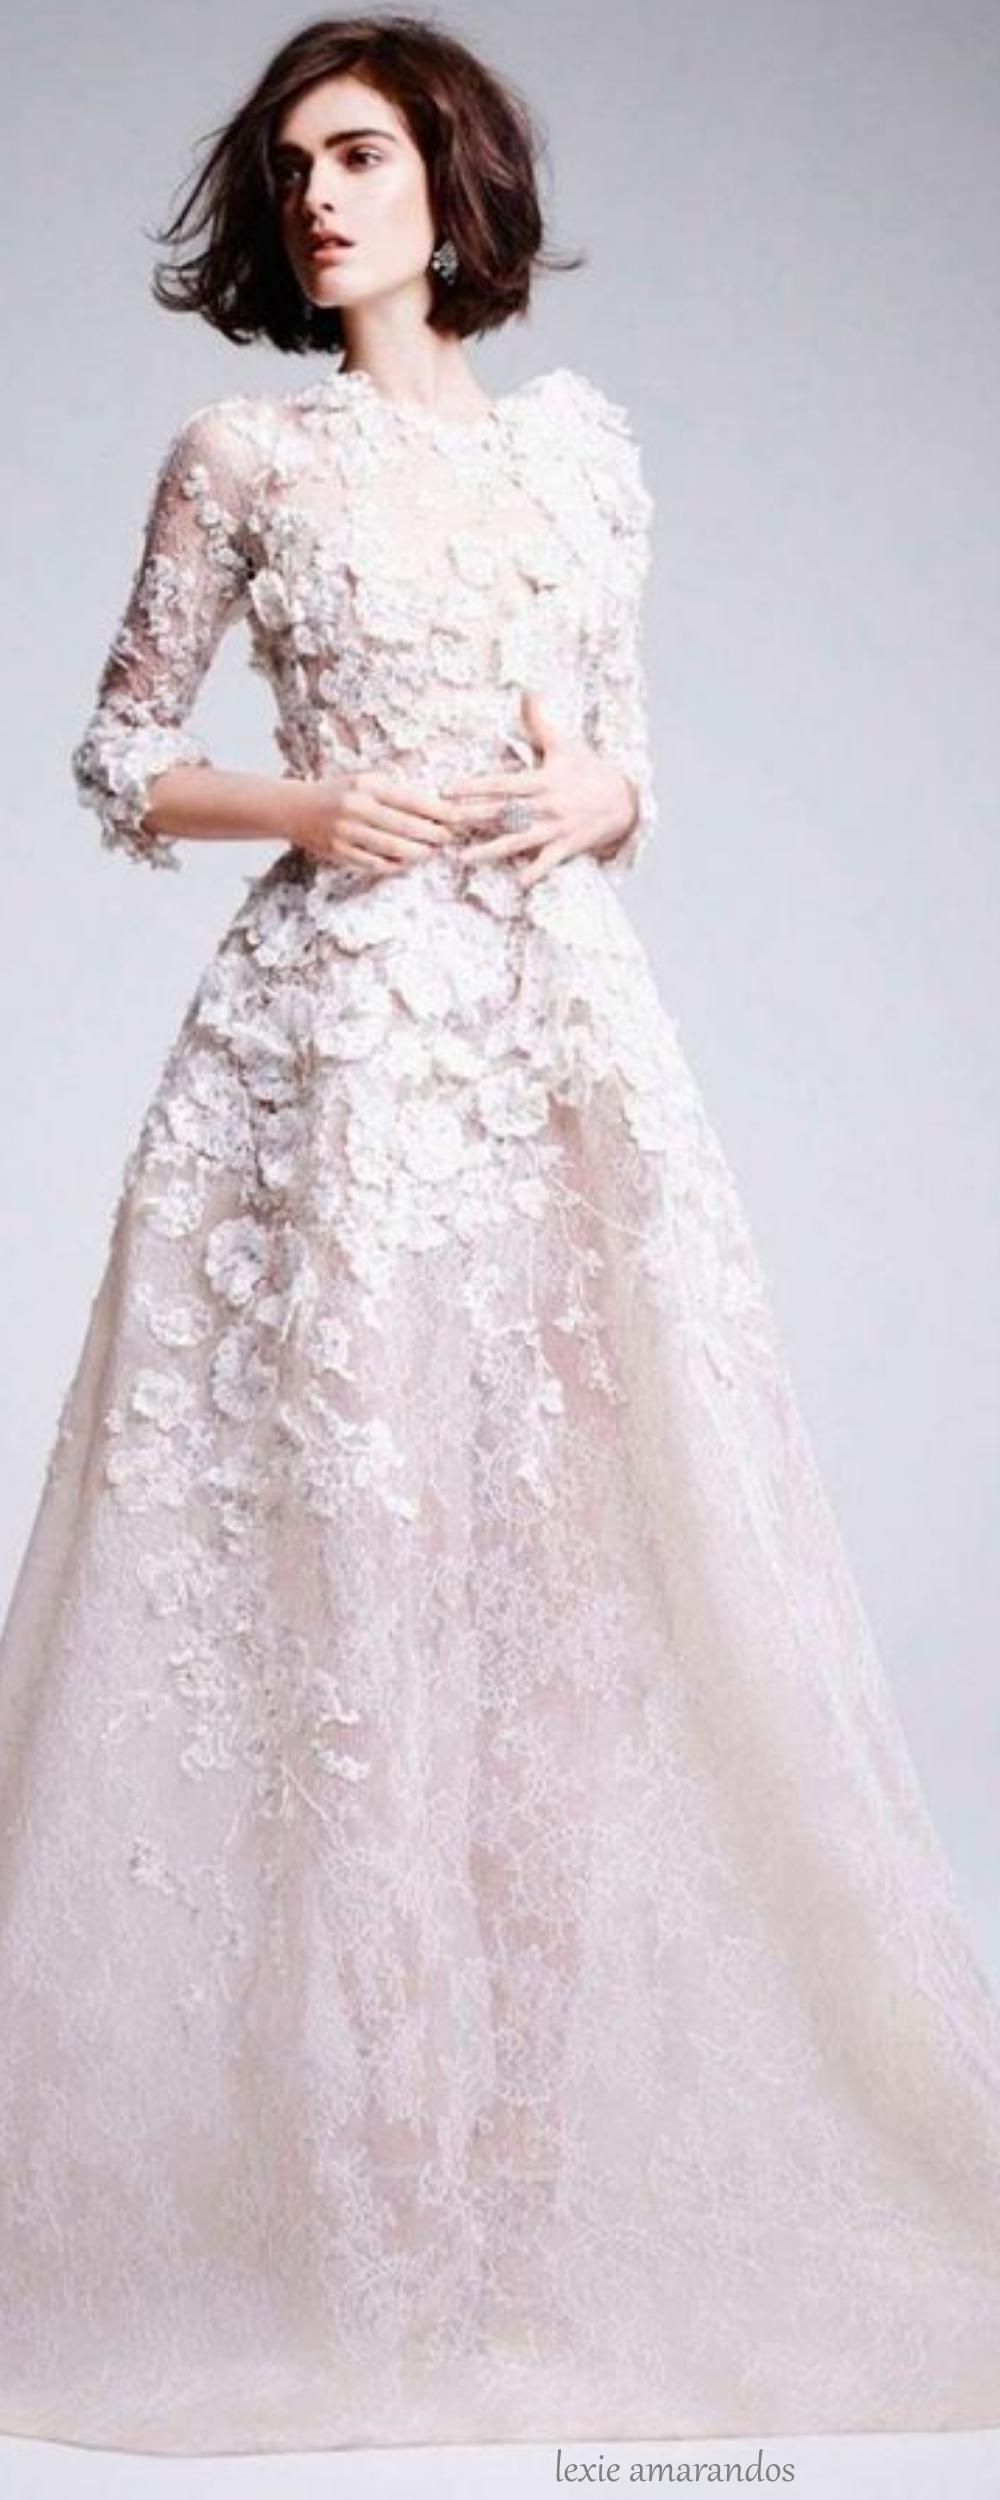 Elie saab gown via lexiea gowns eliesaab wedding dresses